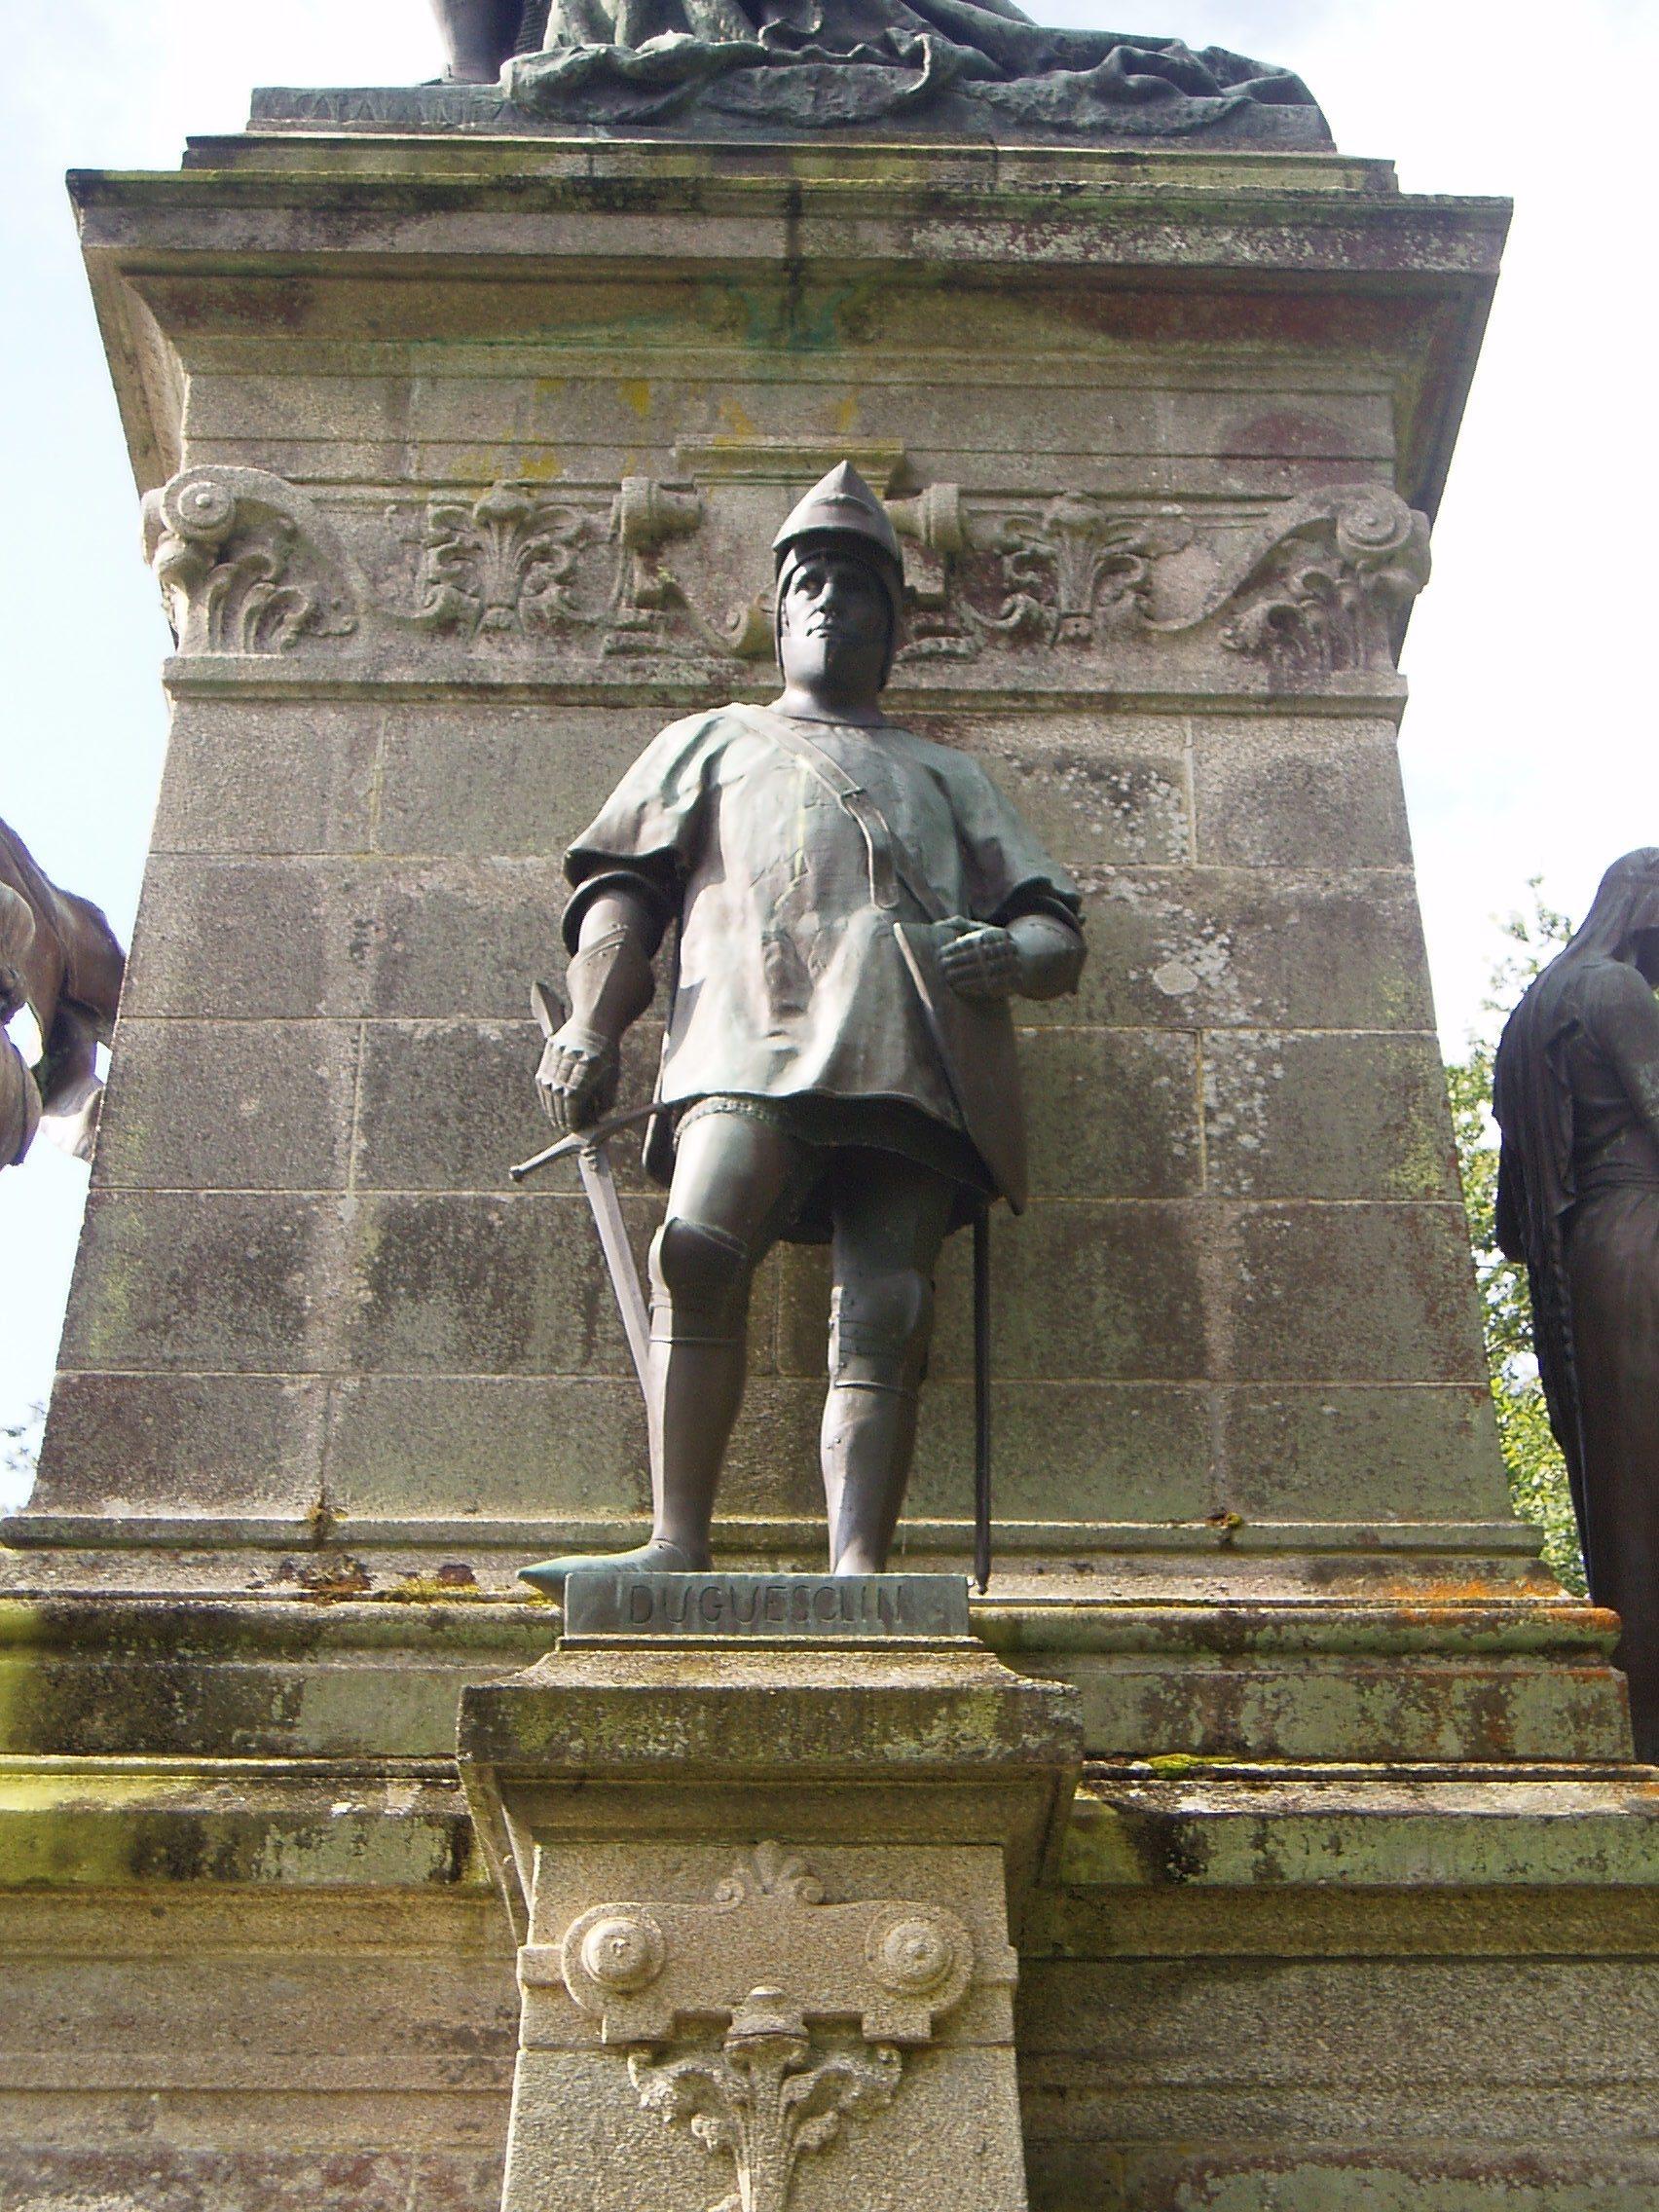 Mémorial du comte de Chambord : Du Guesclin